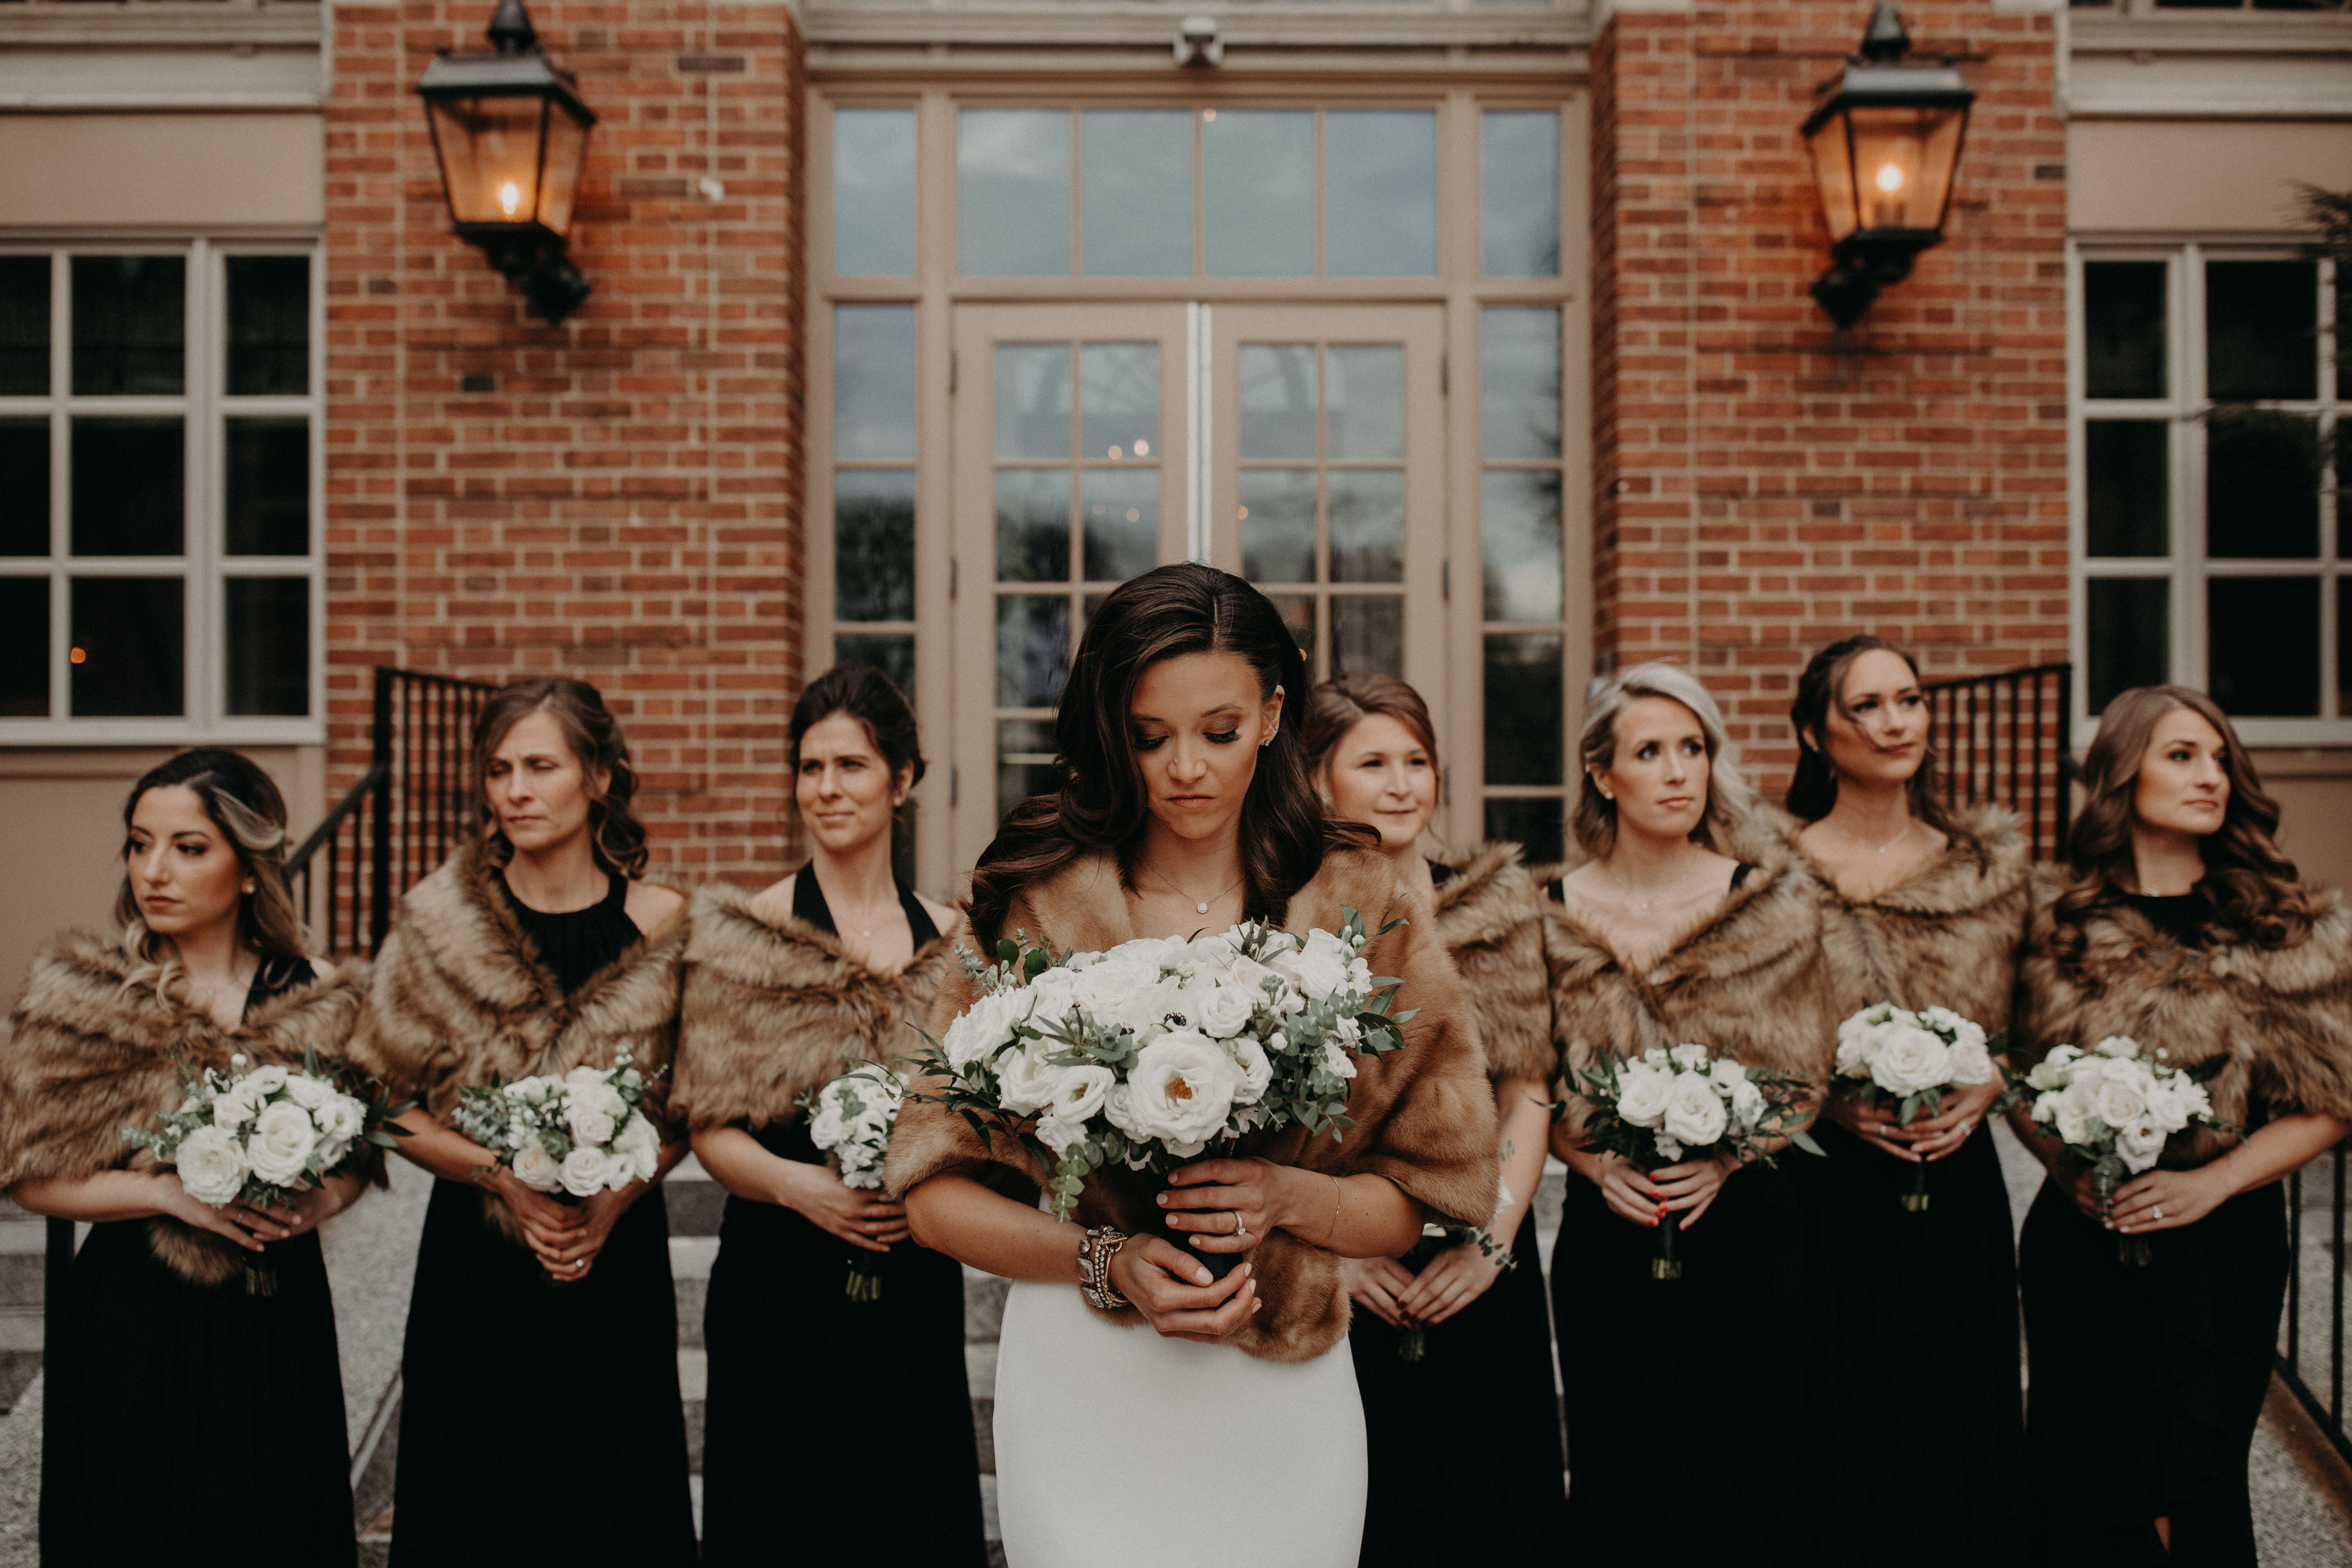 Pin On Wedding Party Detroit Wedding Photographer [ 4449 x 6673 Pixel ]